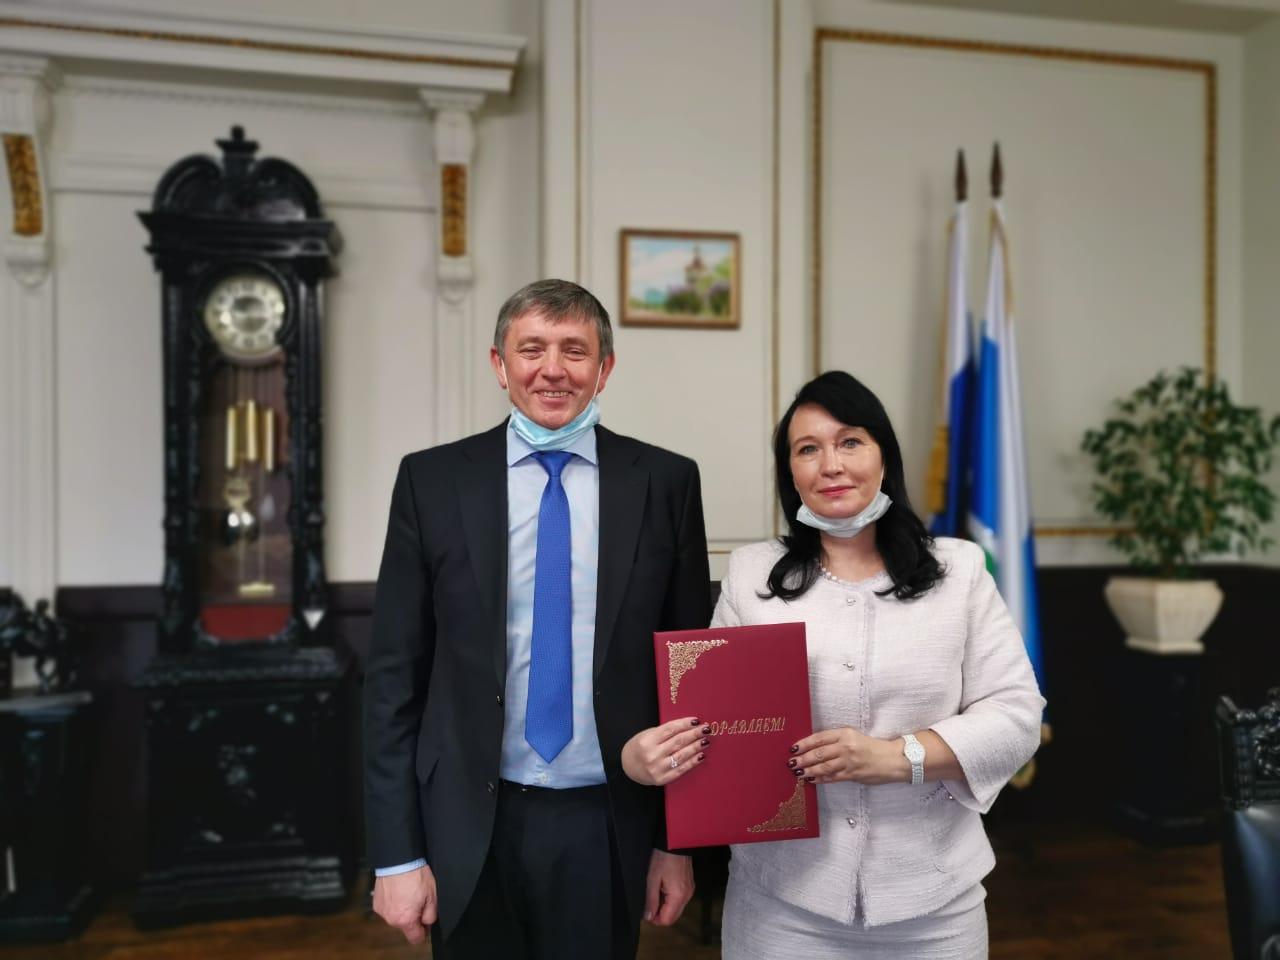 Директор Института экономики УрО РАН Юлия Лаврикова поздравила УрФУ со 100-летним юбилеем